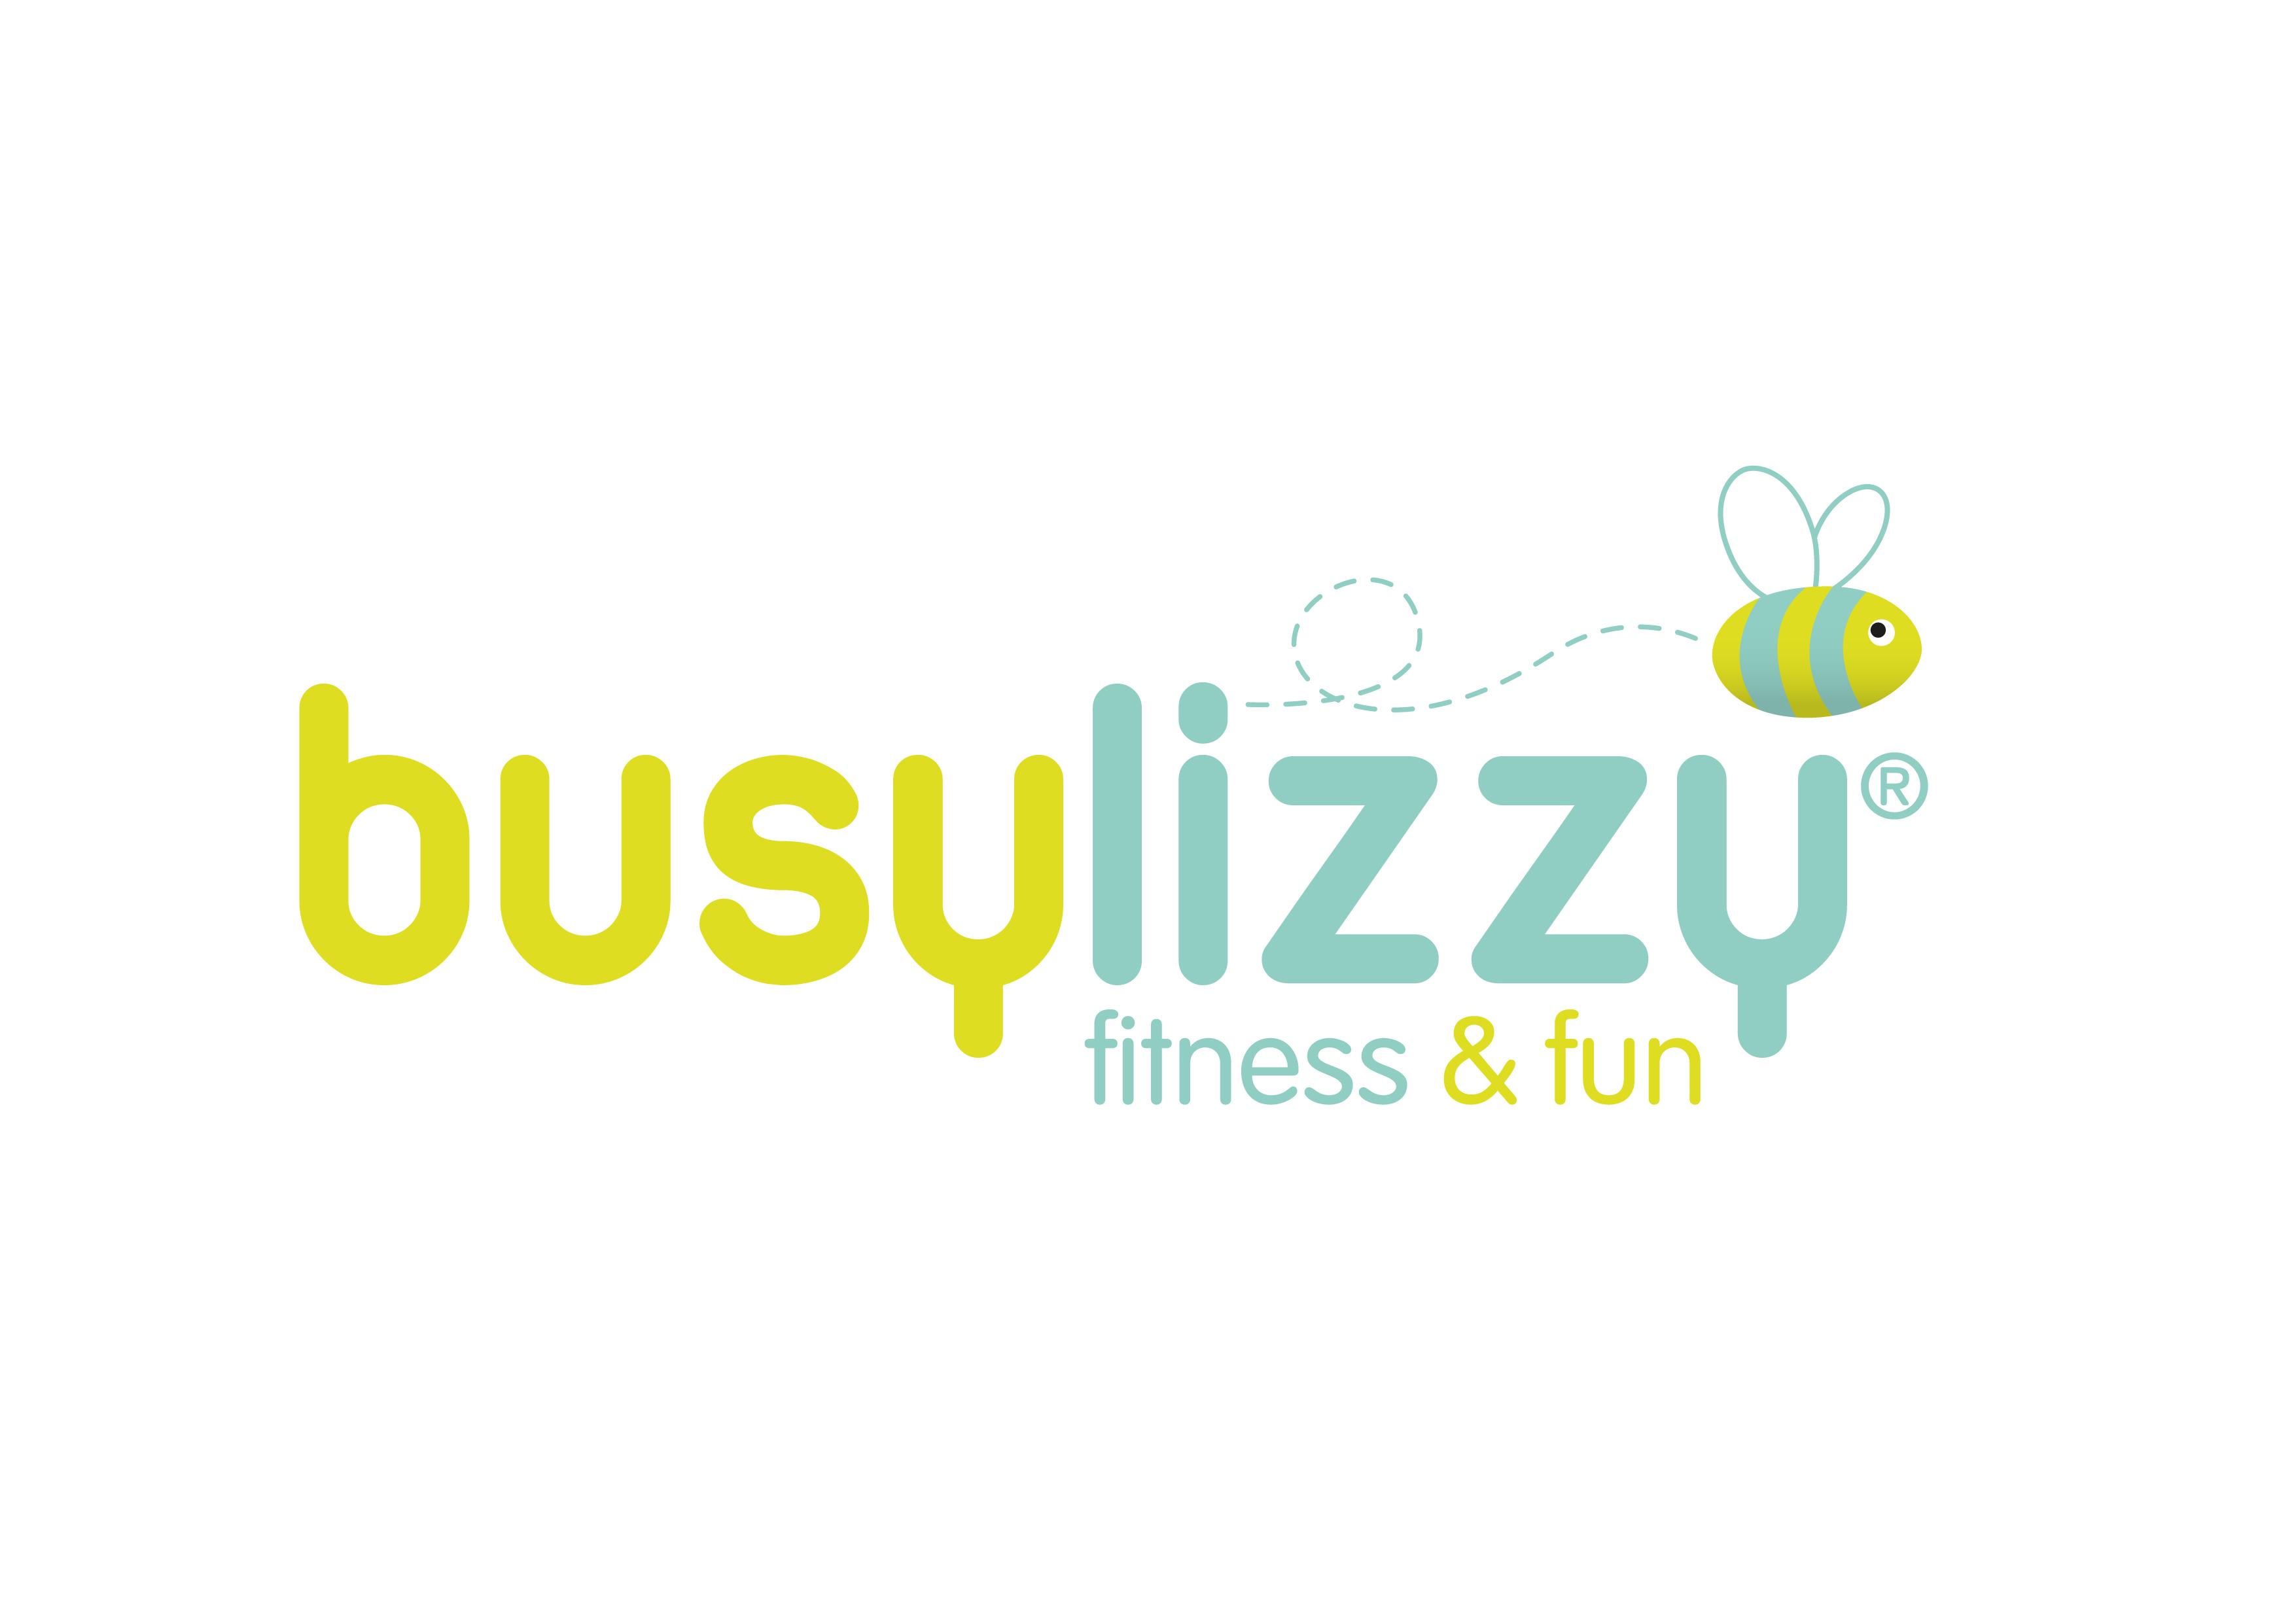 Busylizzy Fitness & Fun's logo